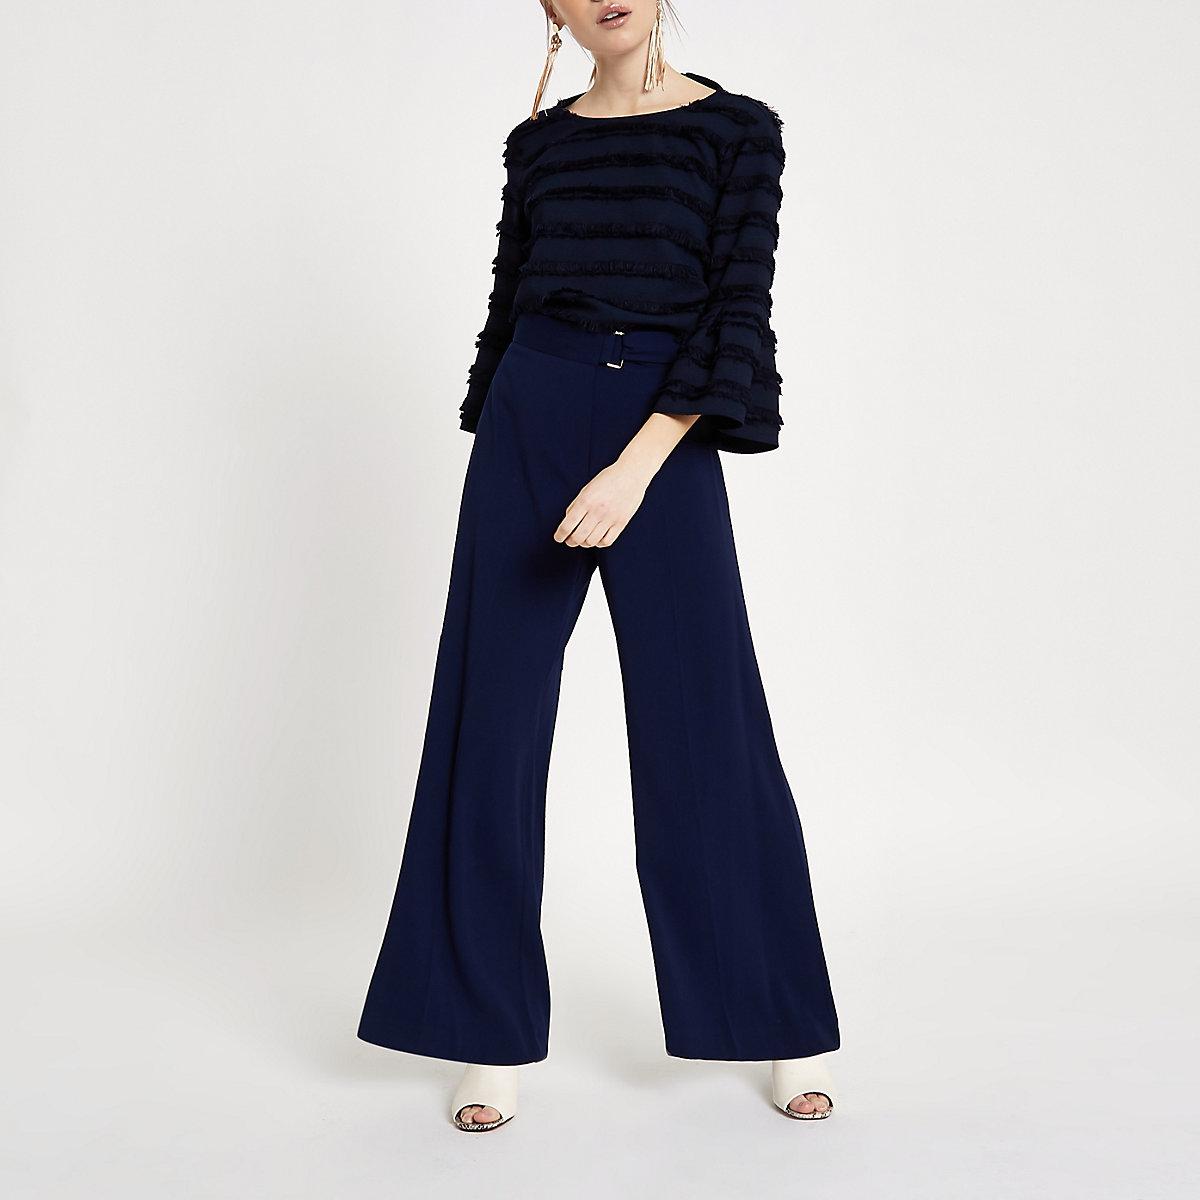 Petite navy belted wide leg pants